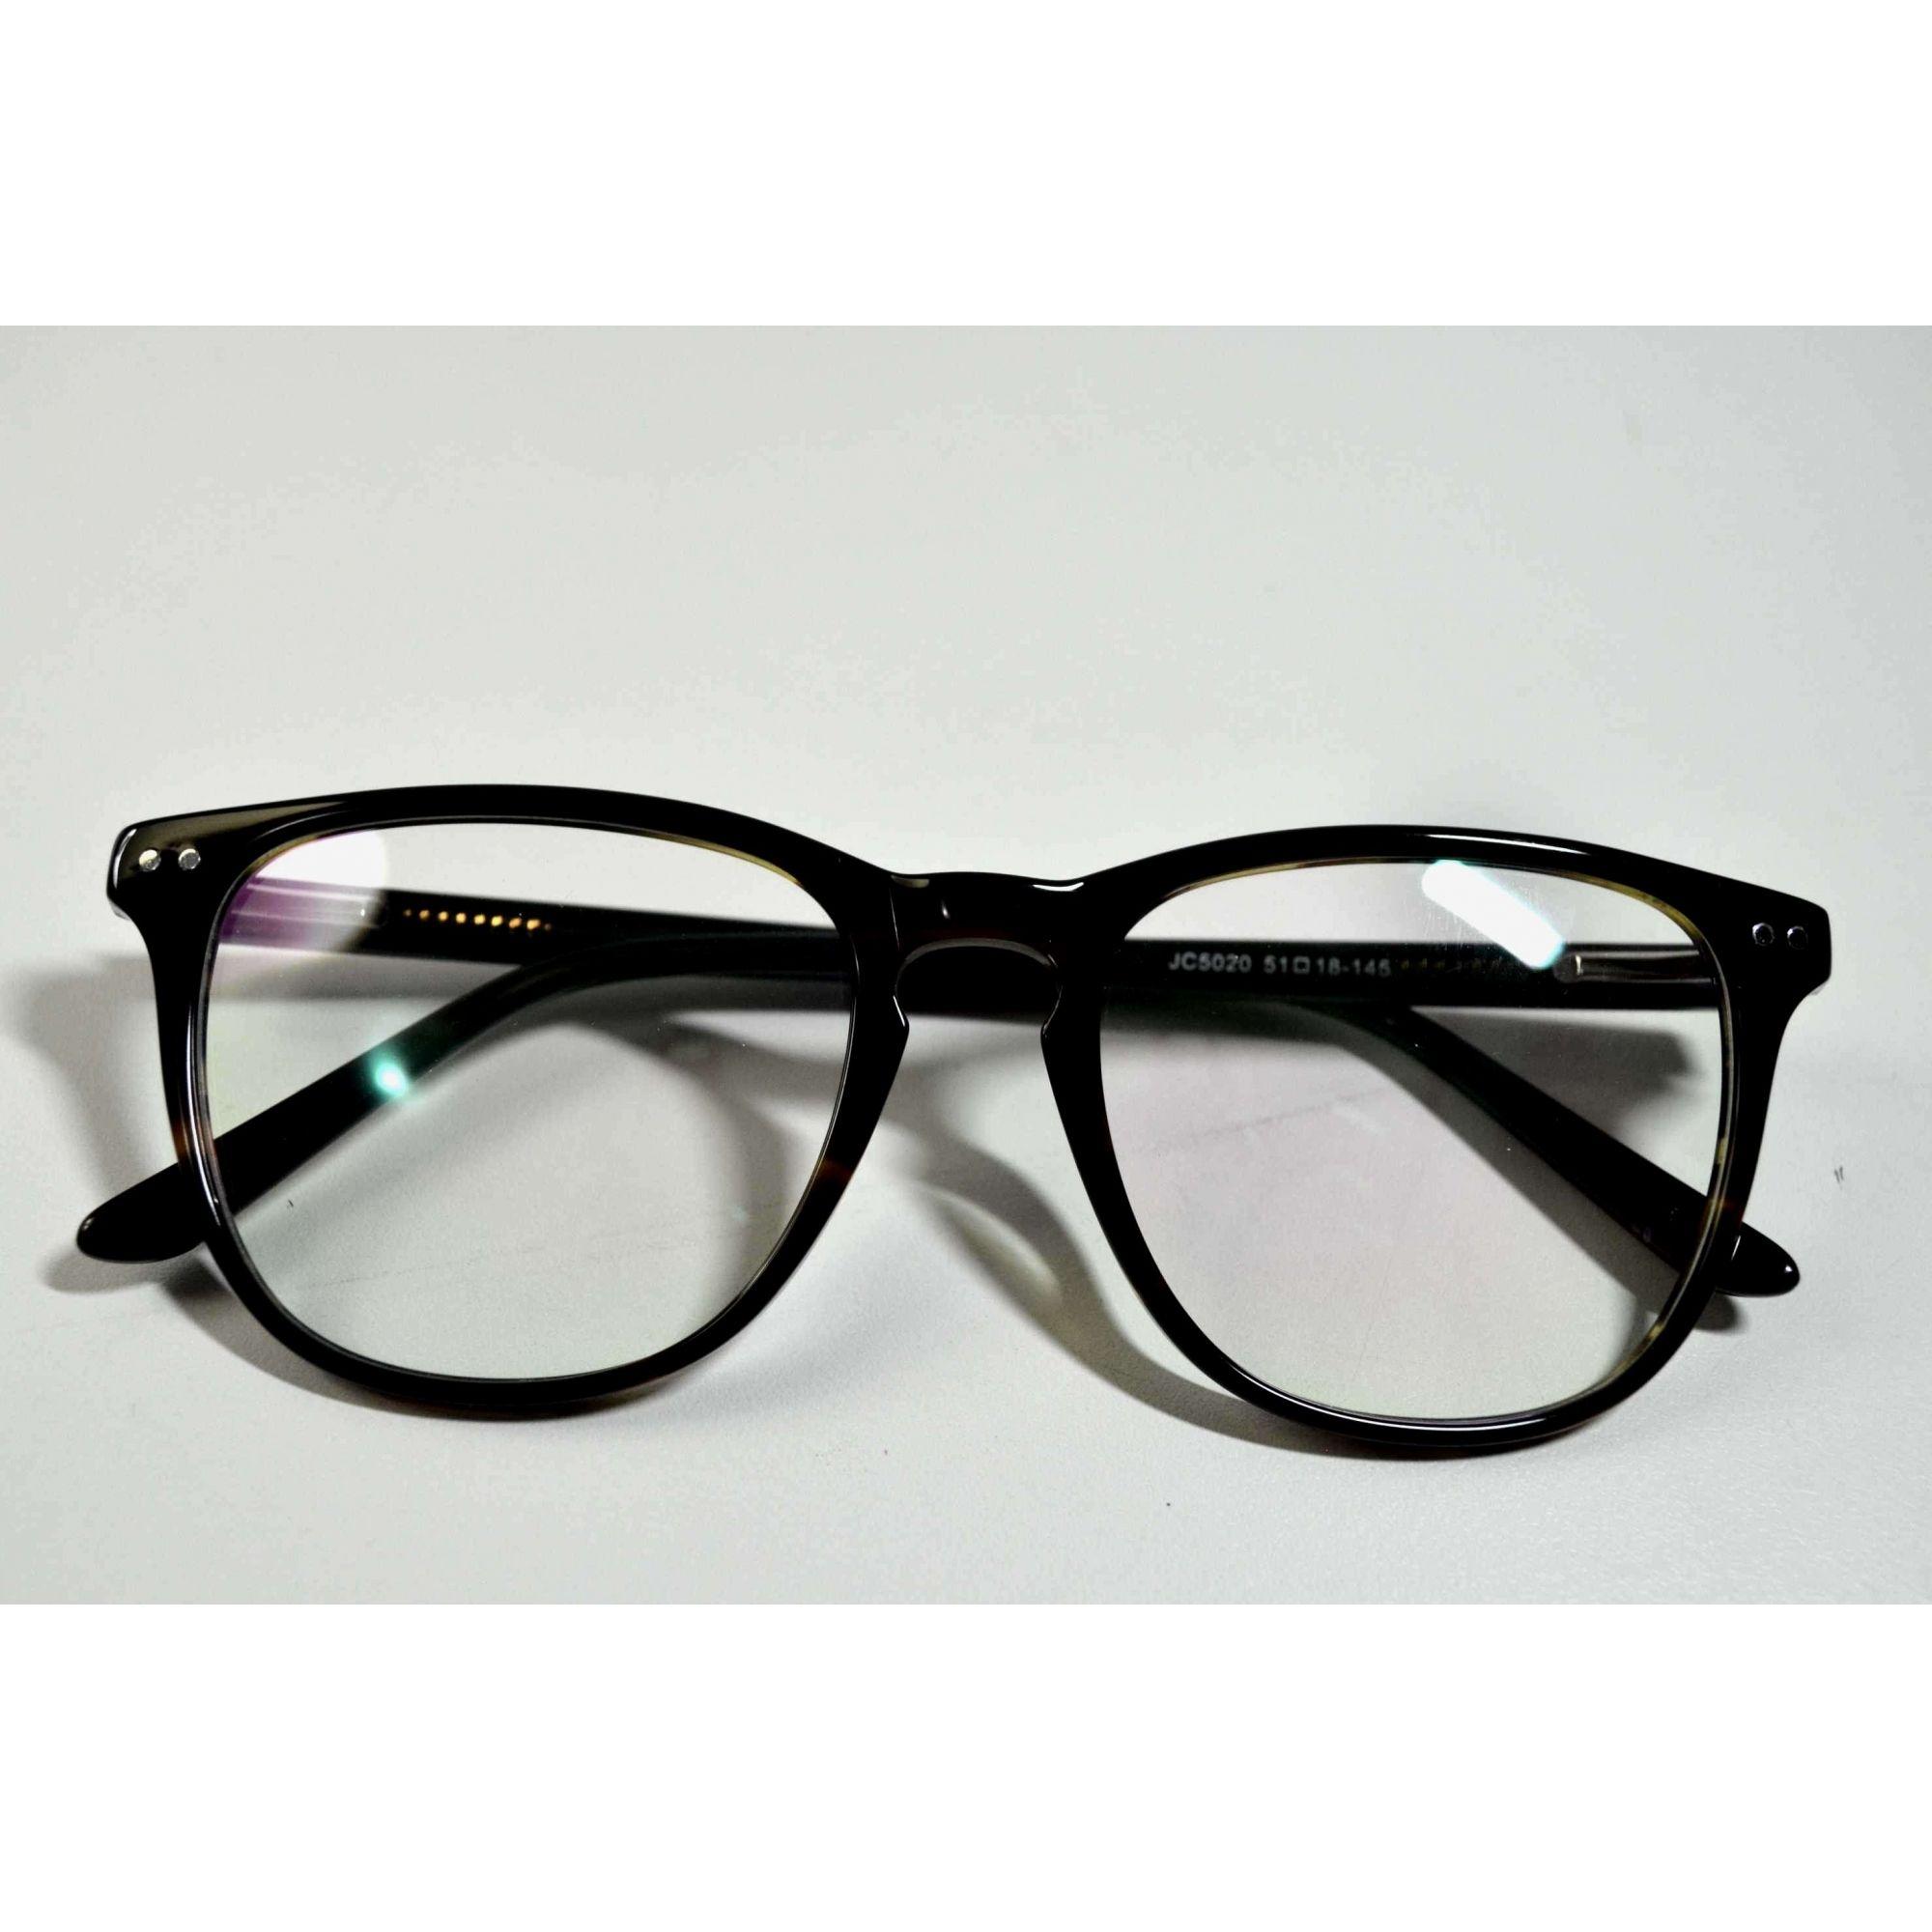 f503f4049ee50 Armação Óculos Grau Feminino Estilo Selena Tartaruga